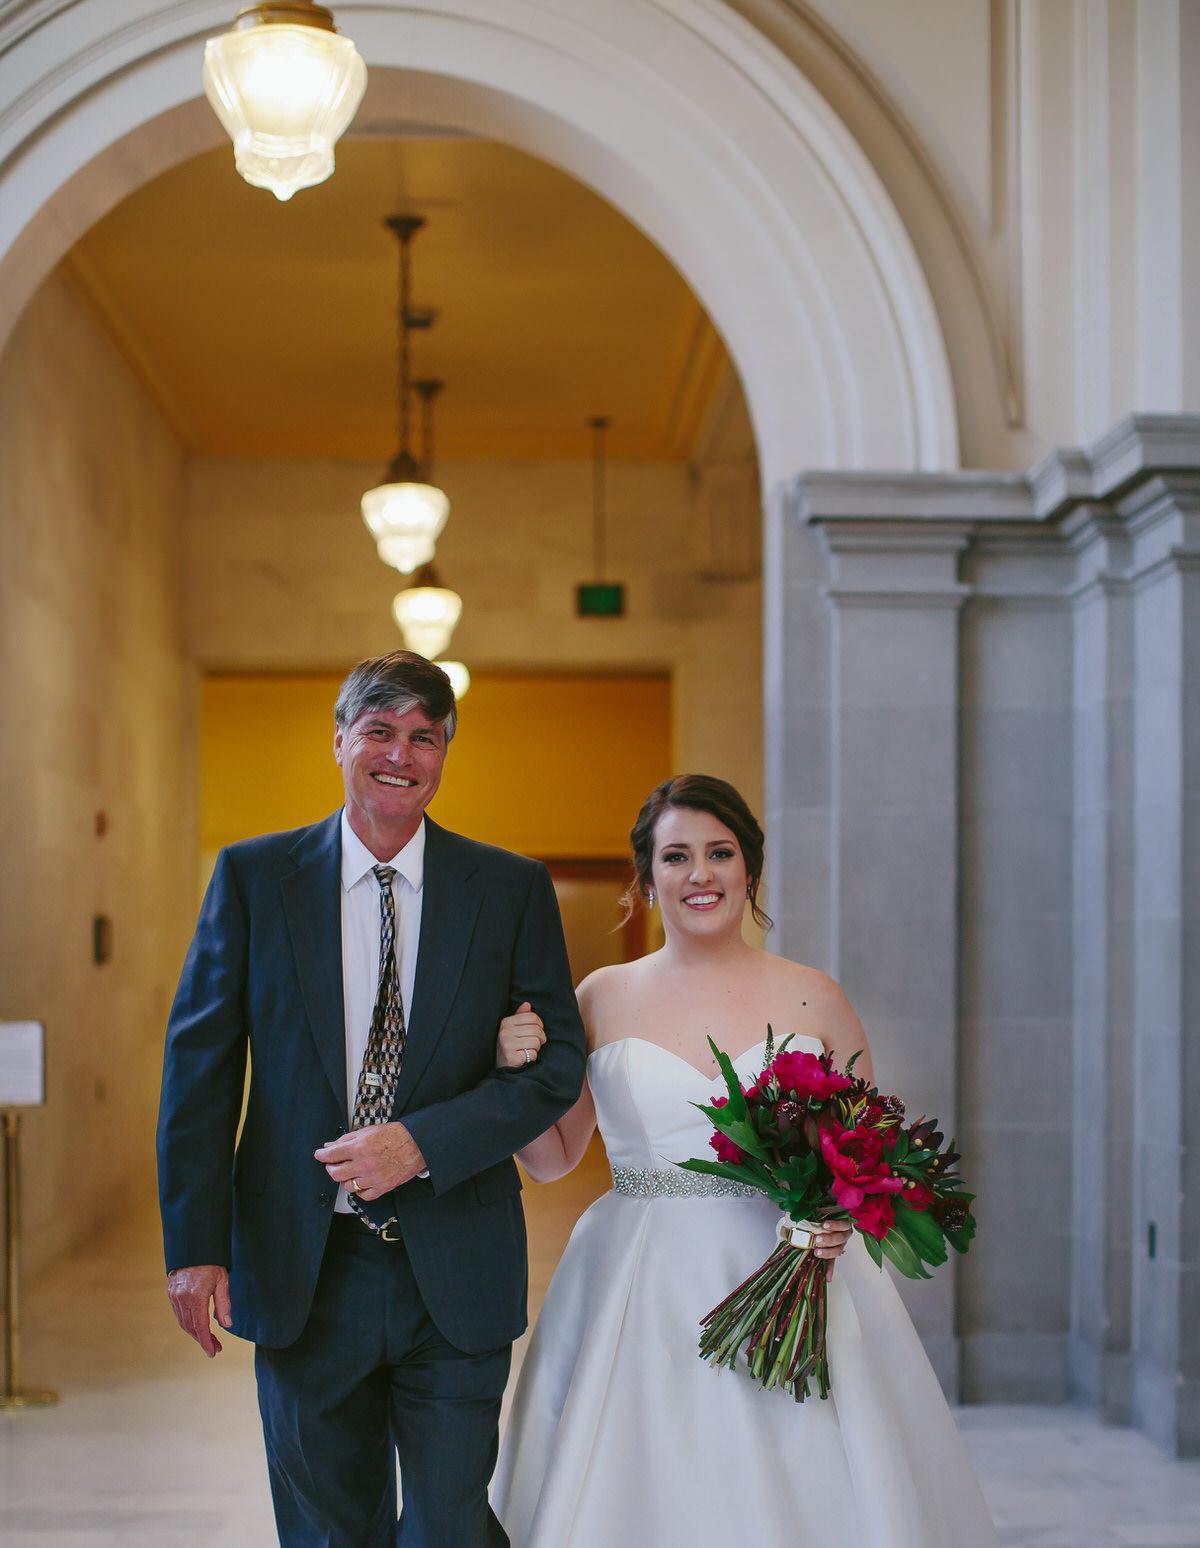 father_bride_wedding_bay_area_photographer.jpg